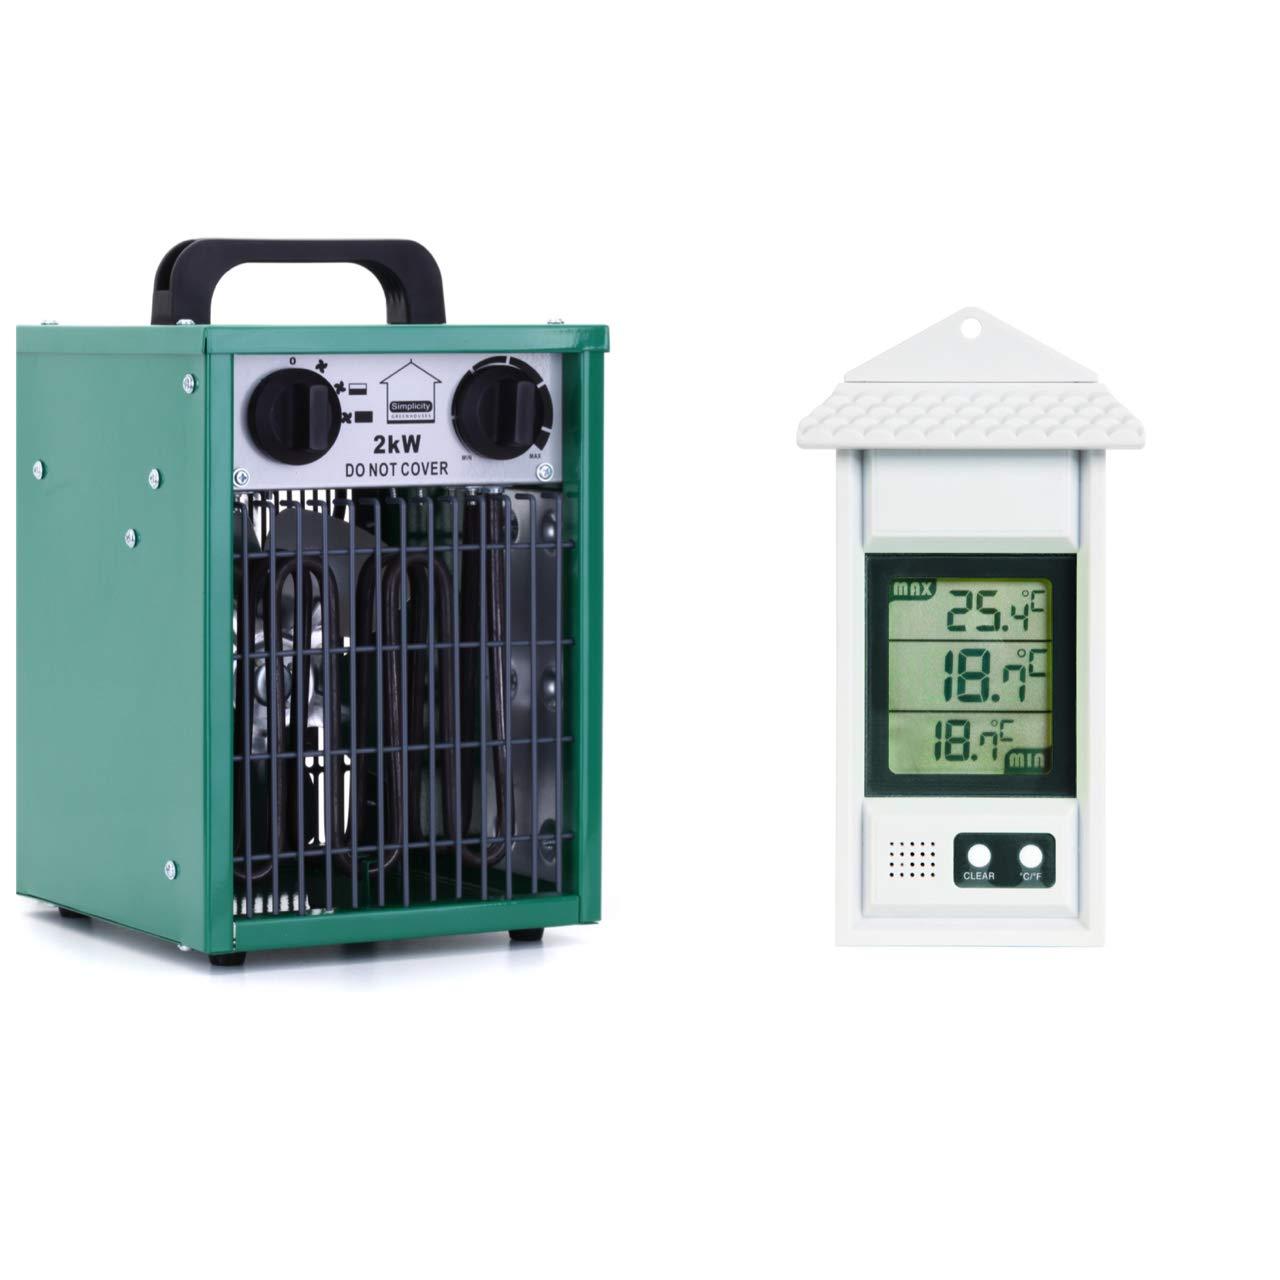 Simplicity Heater Set 2kW Greenhouse fan heater + Digital max/min thermometer